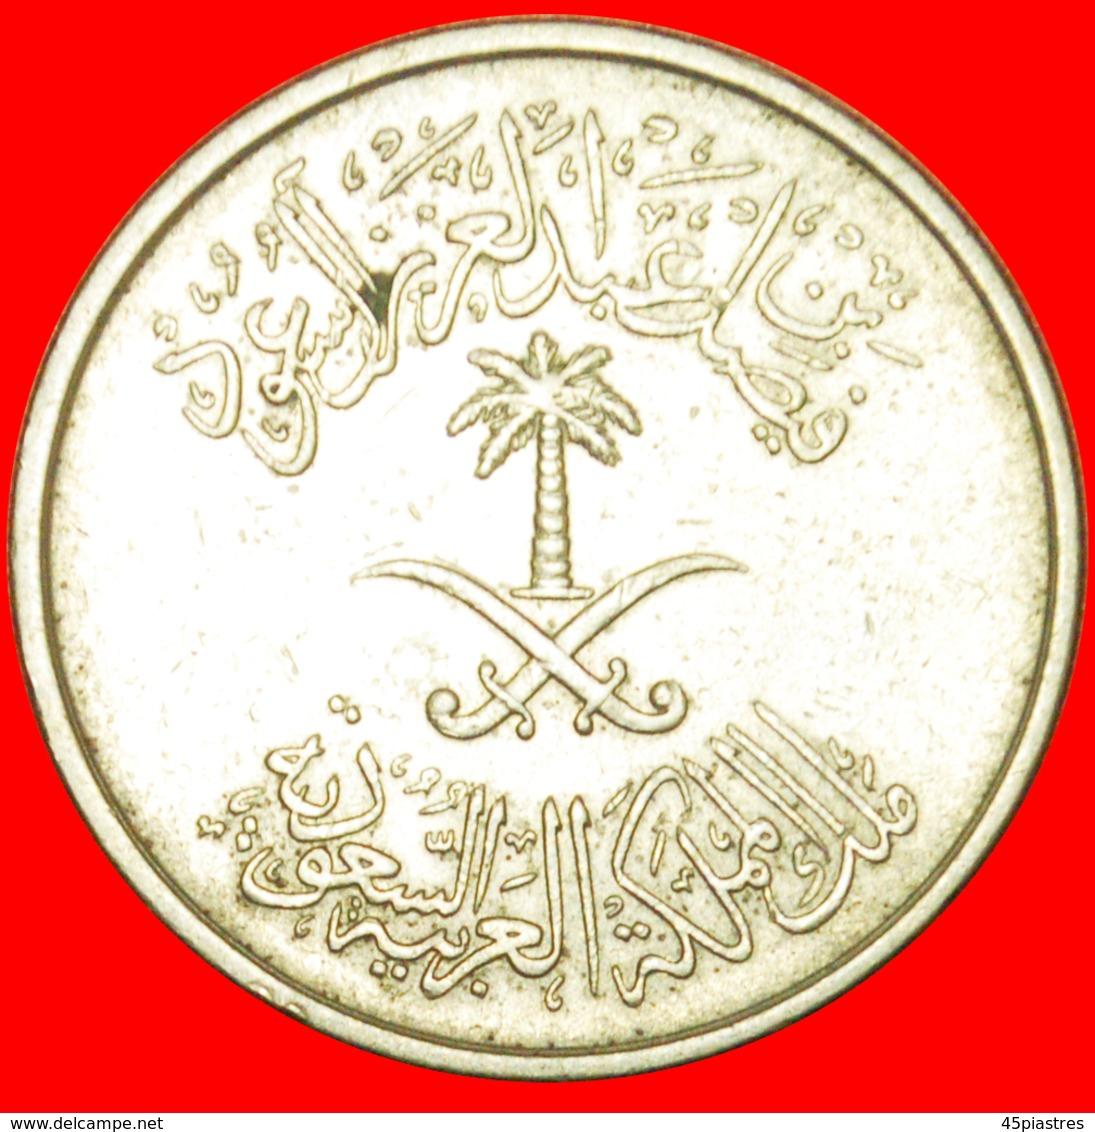 # DAGGERS AND PALMTREE: SAUDI ARABIA ★ 50 HALALA / HALF RIYAL 1392 (1972)! LOW START ★ NO RESERVE! - Saudi Arabia